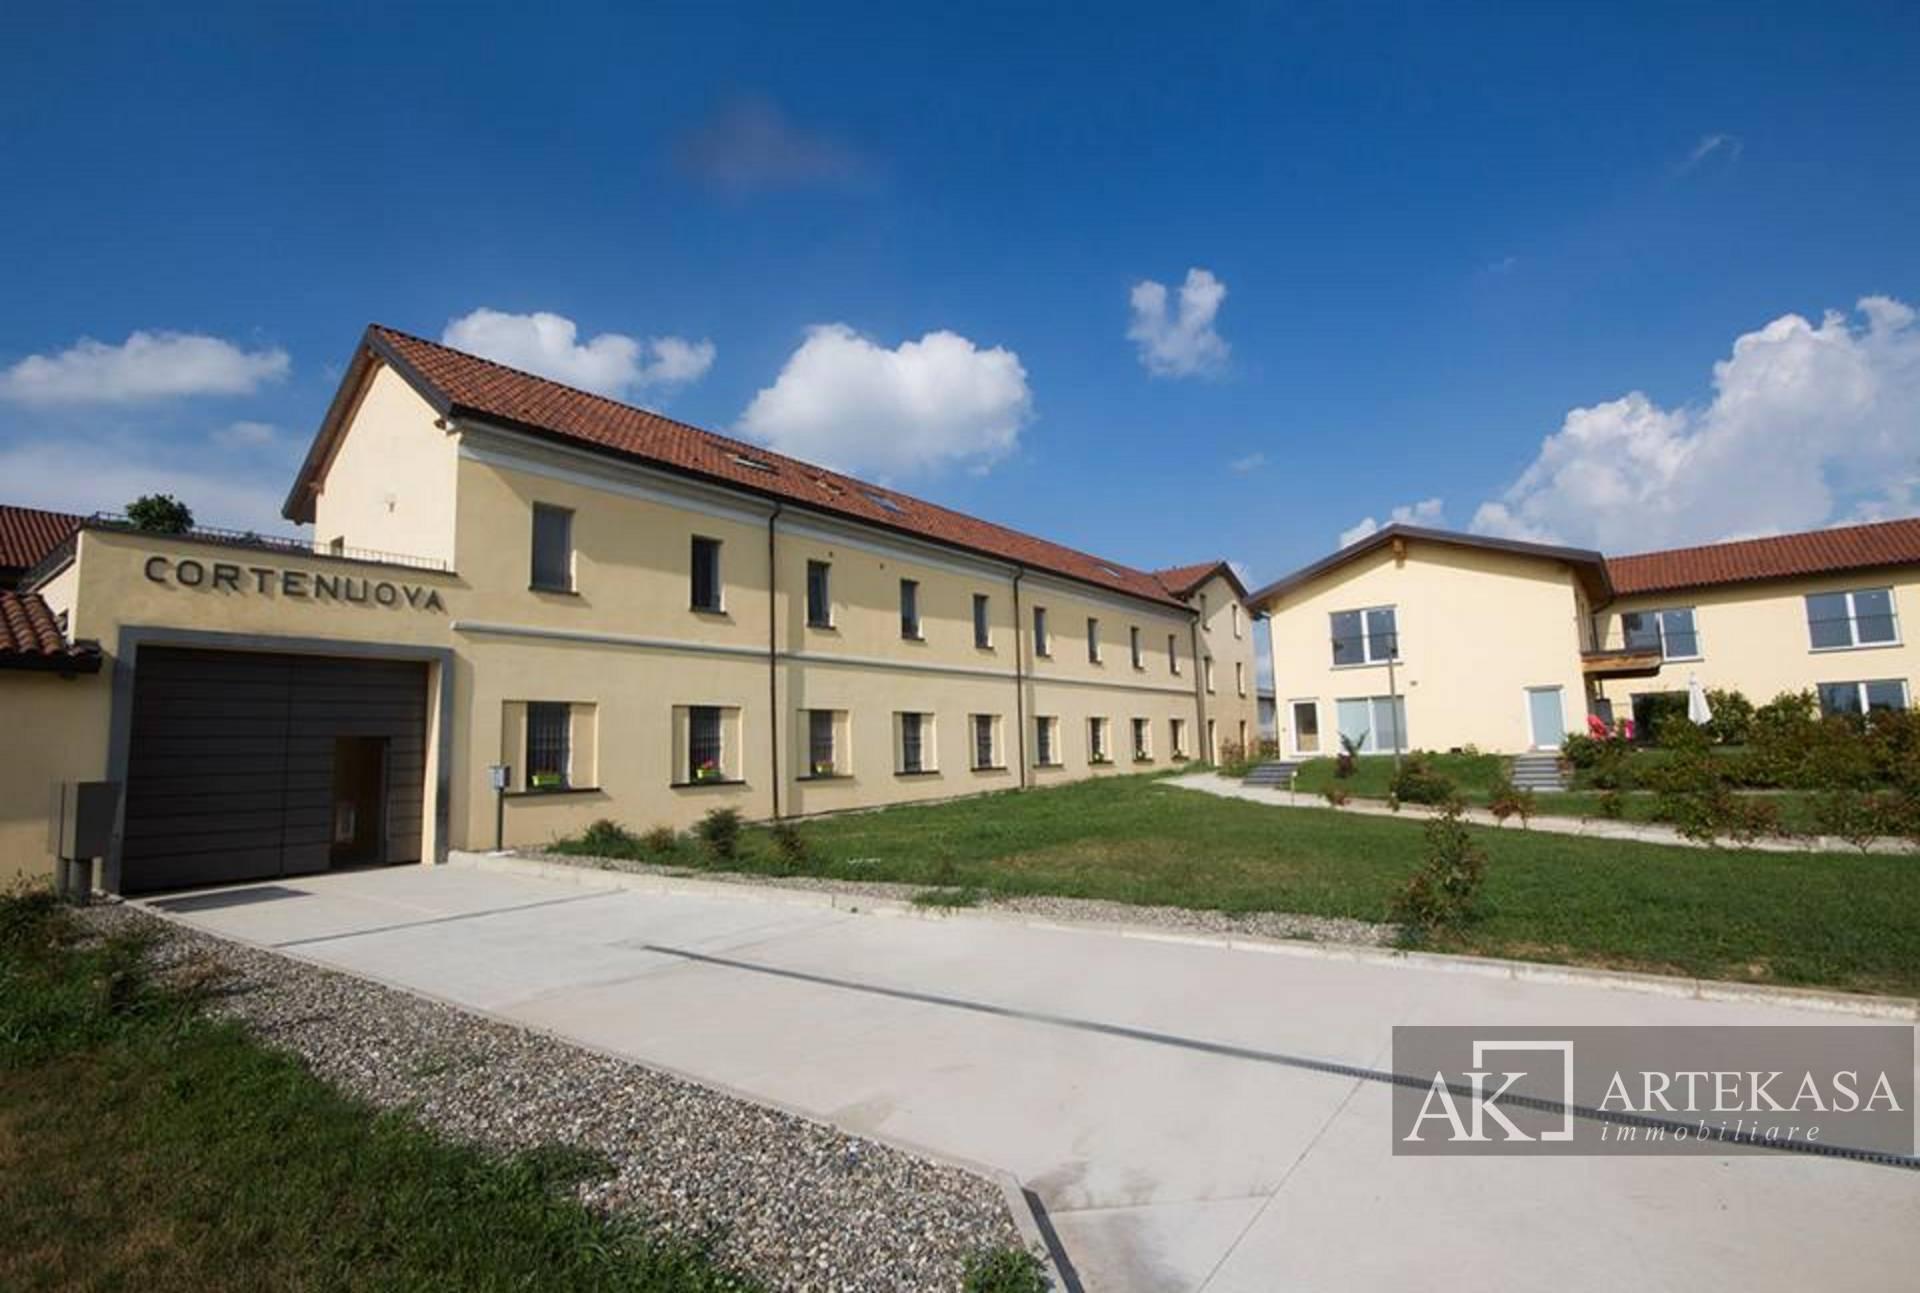 Mansarda Novara - Cittadella - Villaggio Dalmazia - Torrion Quartara